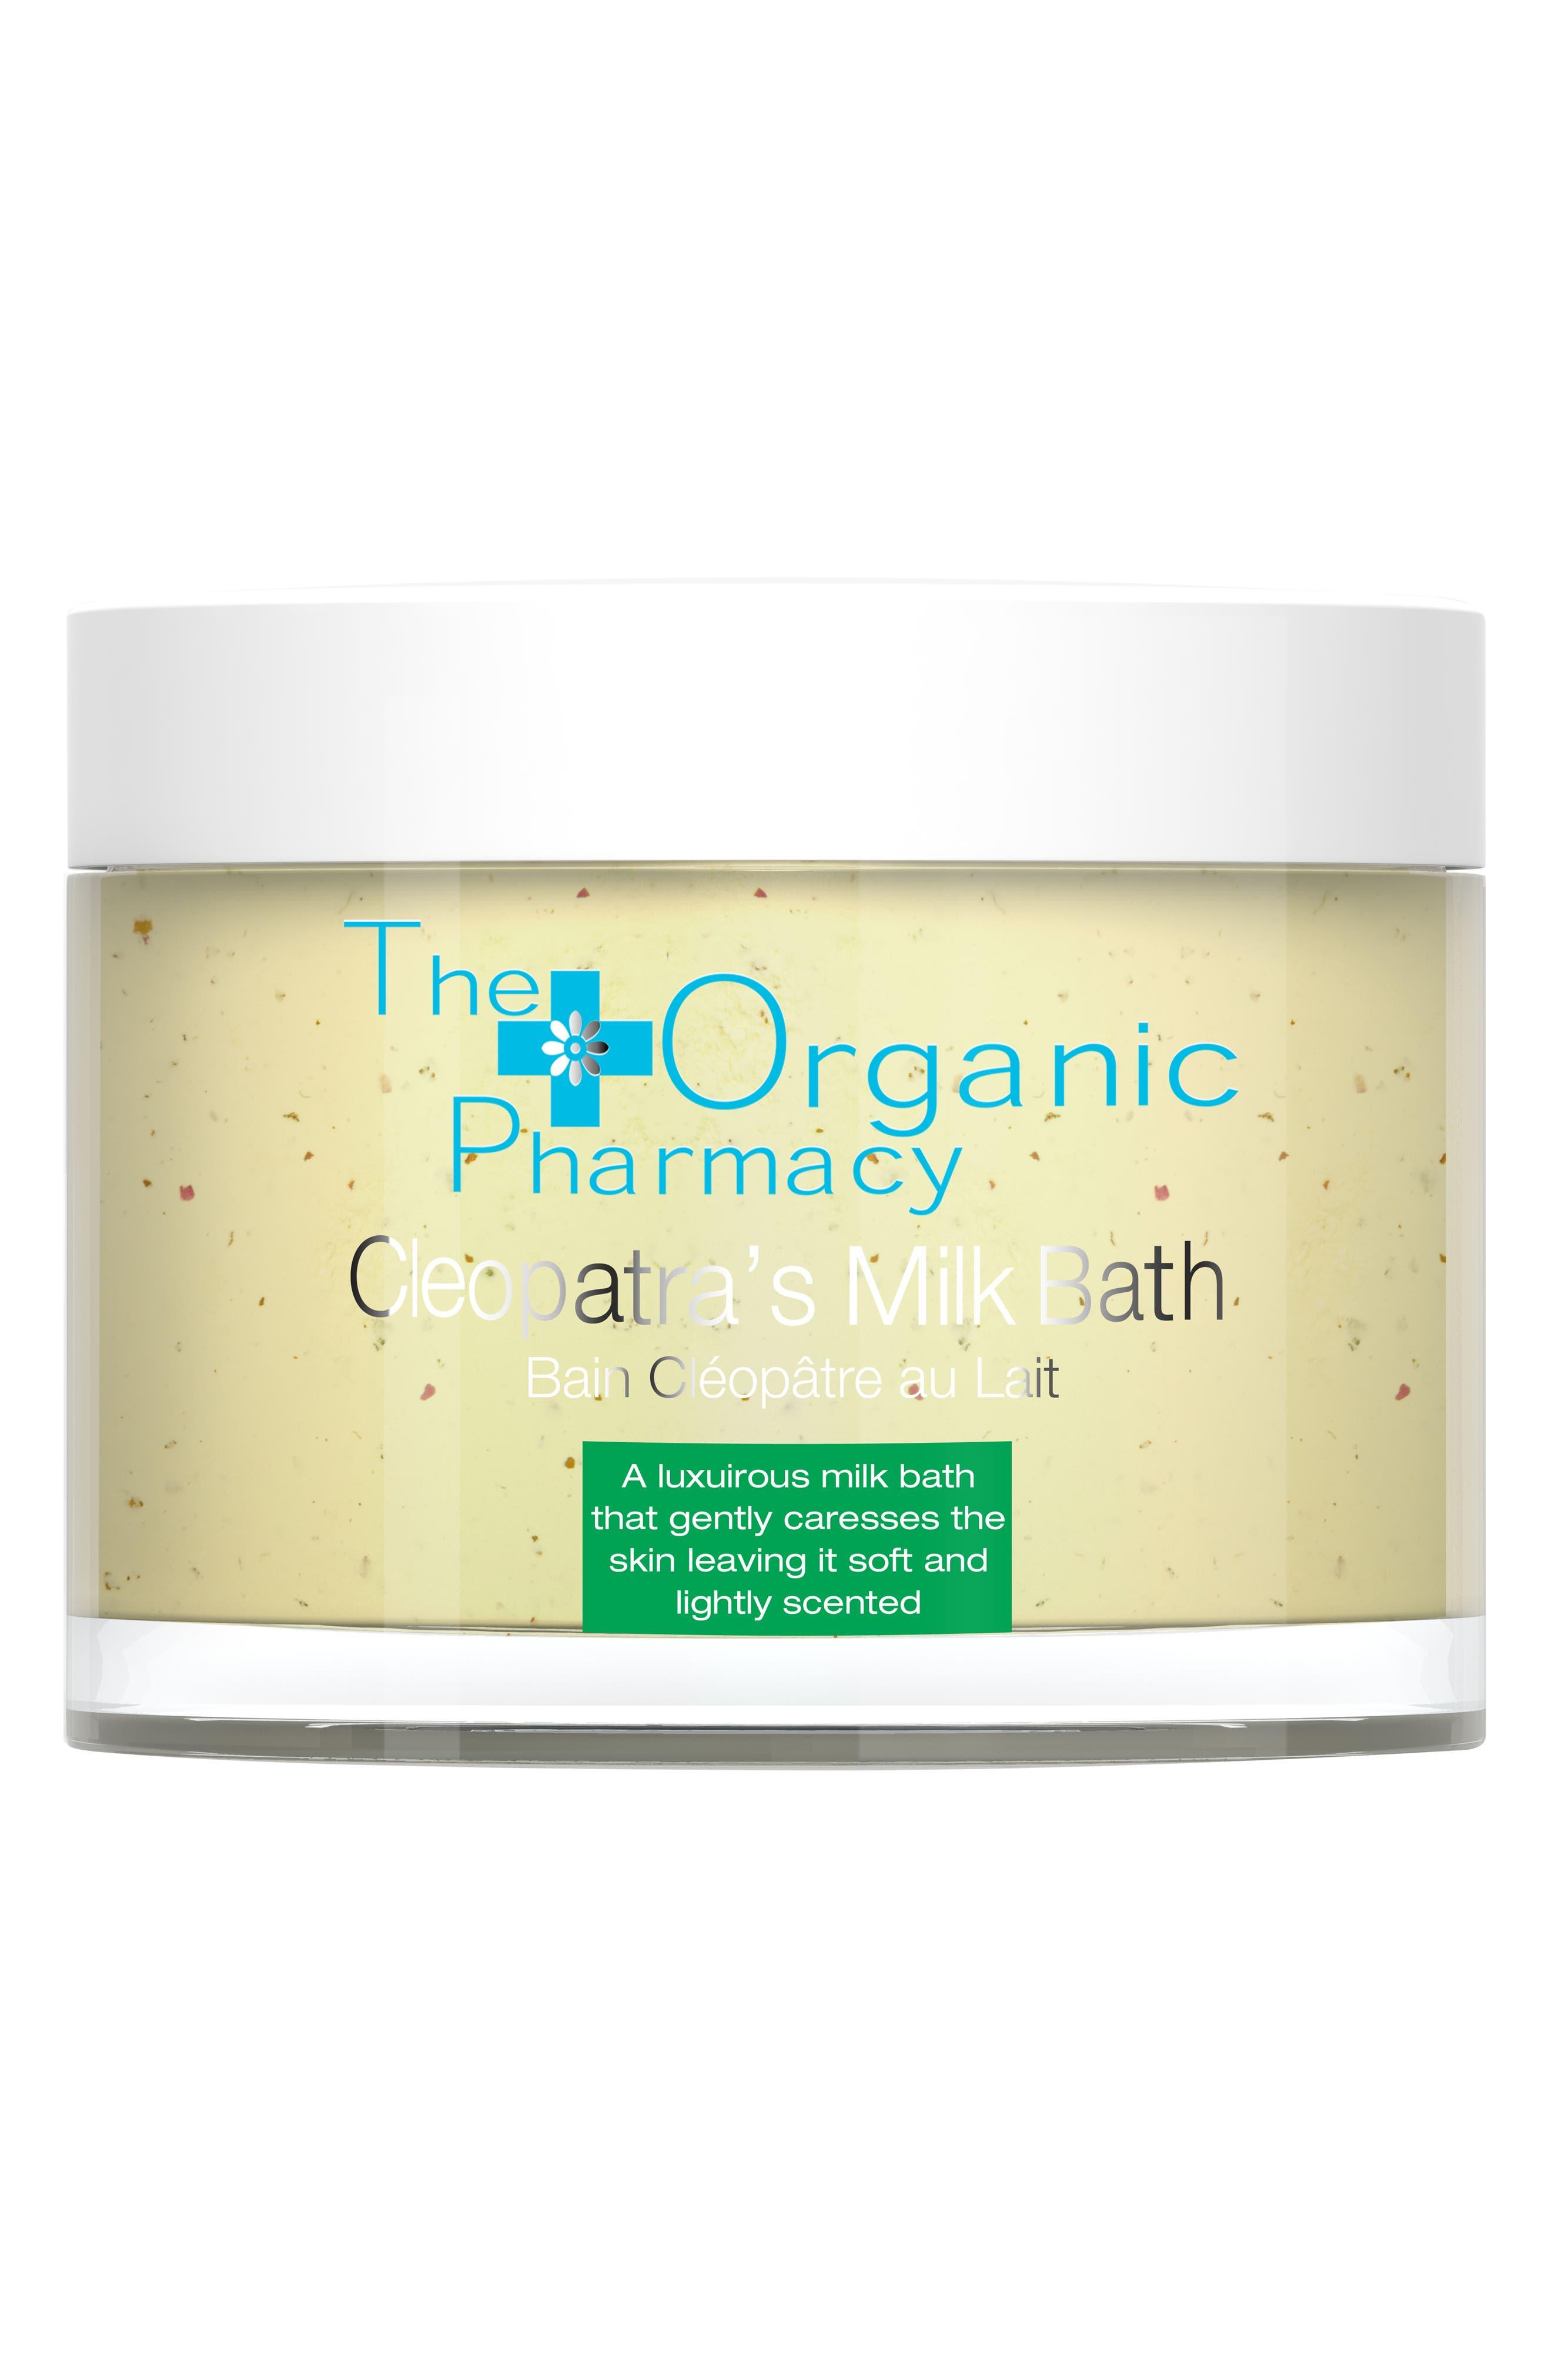 The Organic Pharmacy Cleopatra's Milk Bath